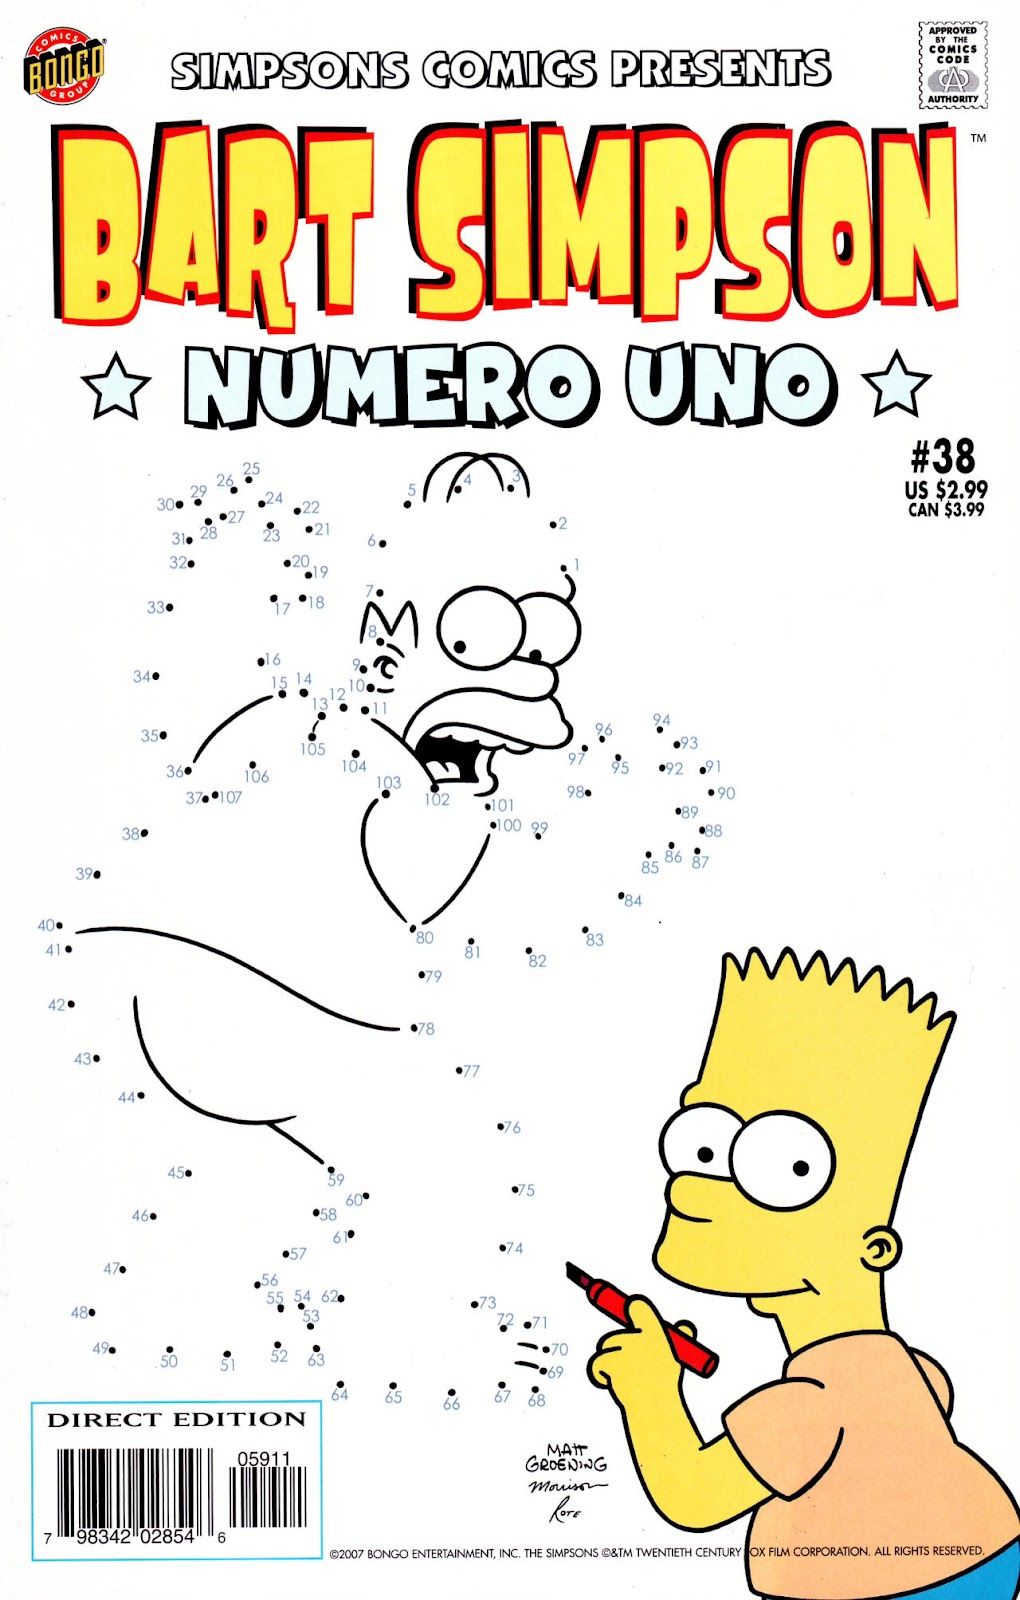 Simpsons Comics Presents Bart Simpson 38 Page 1